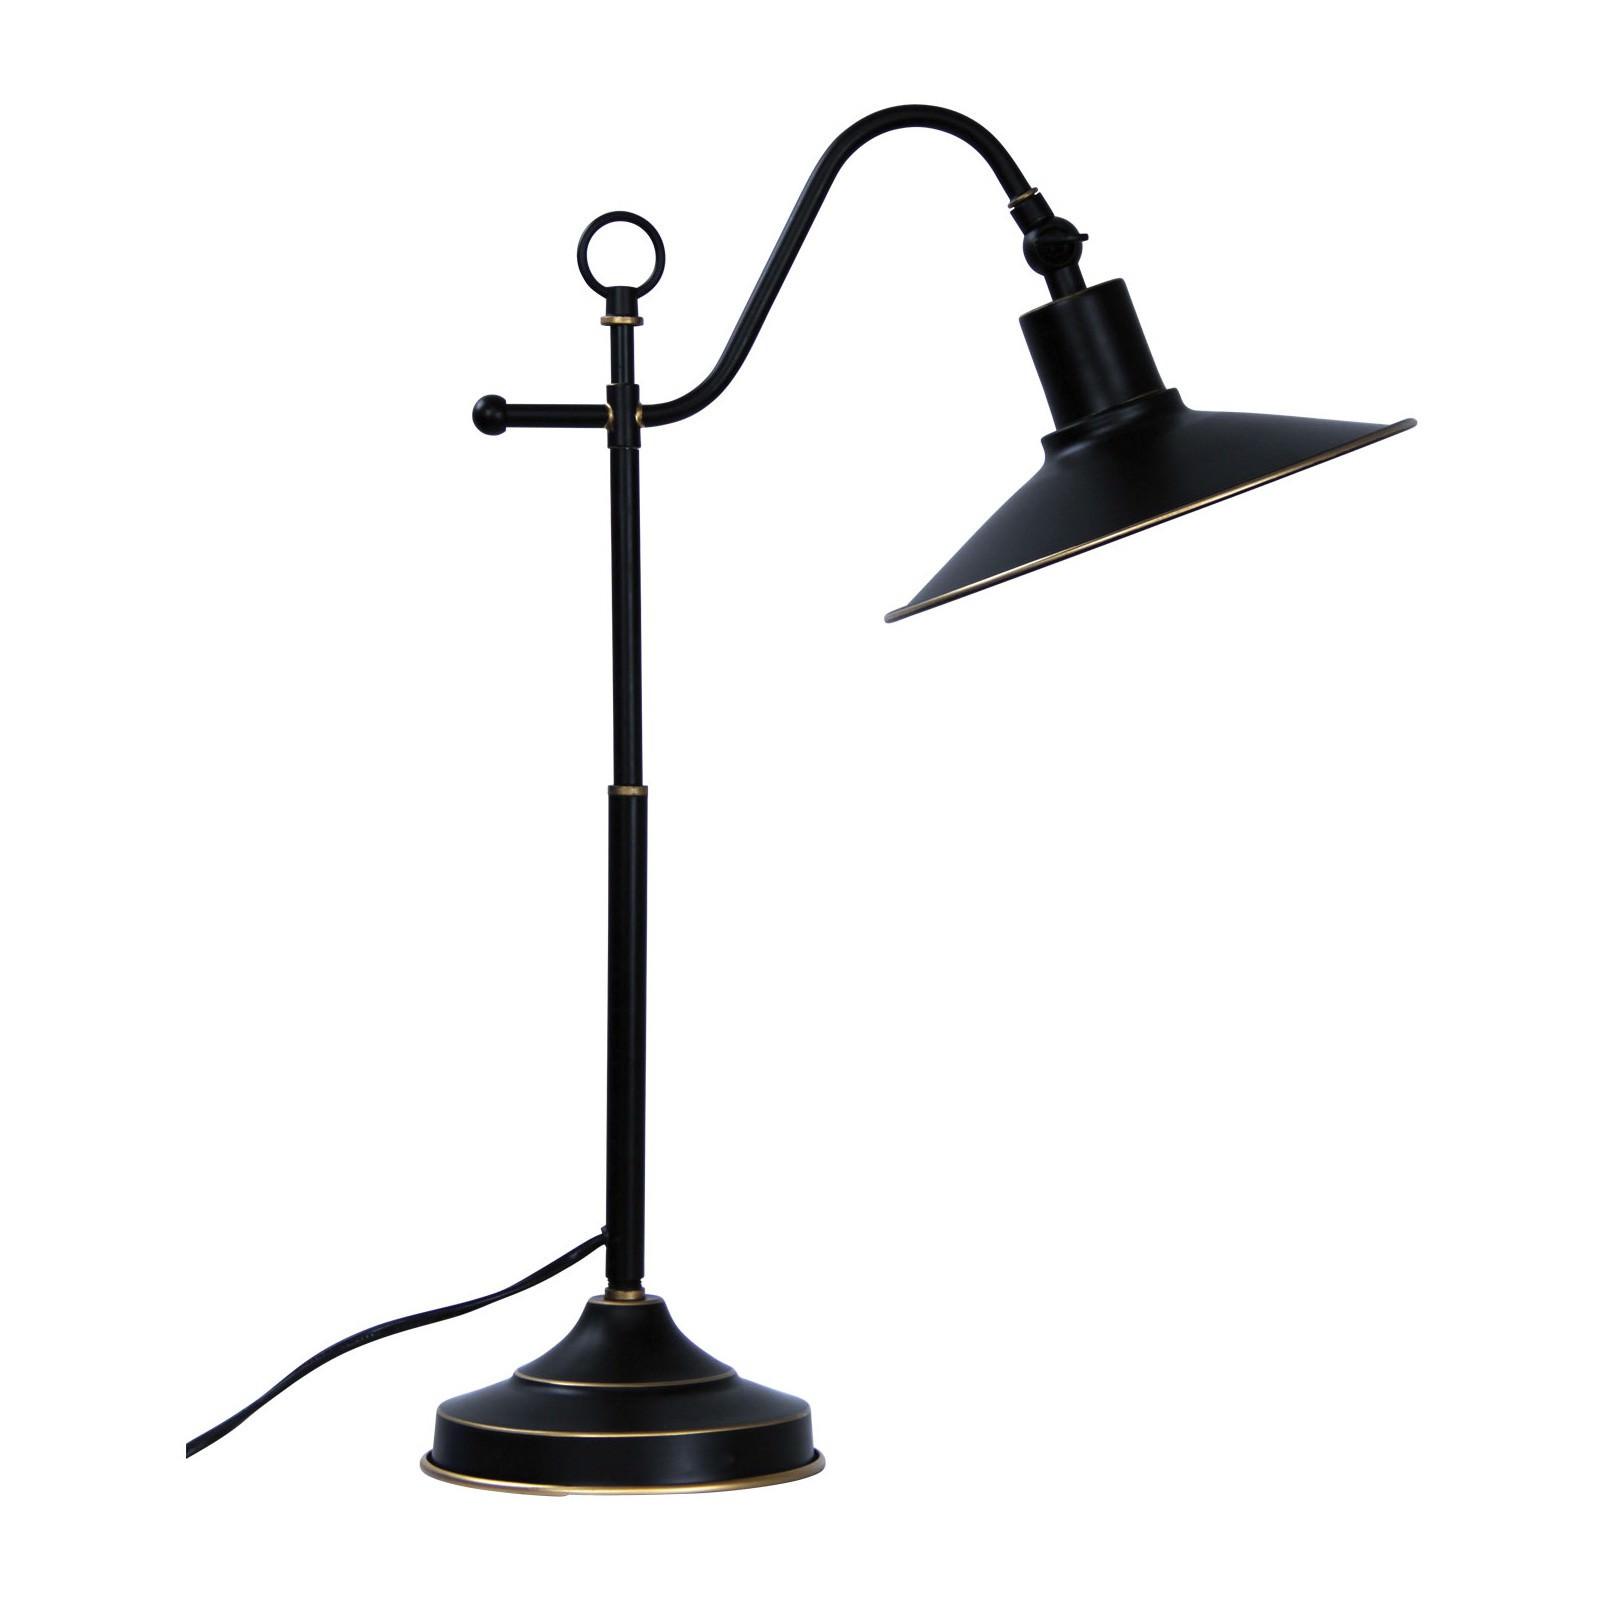 Boston Metal Table / Desk Lamp